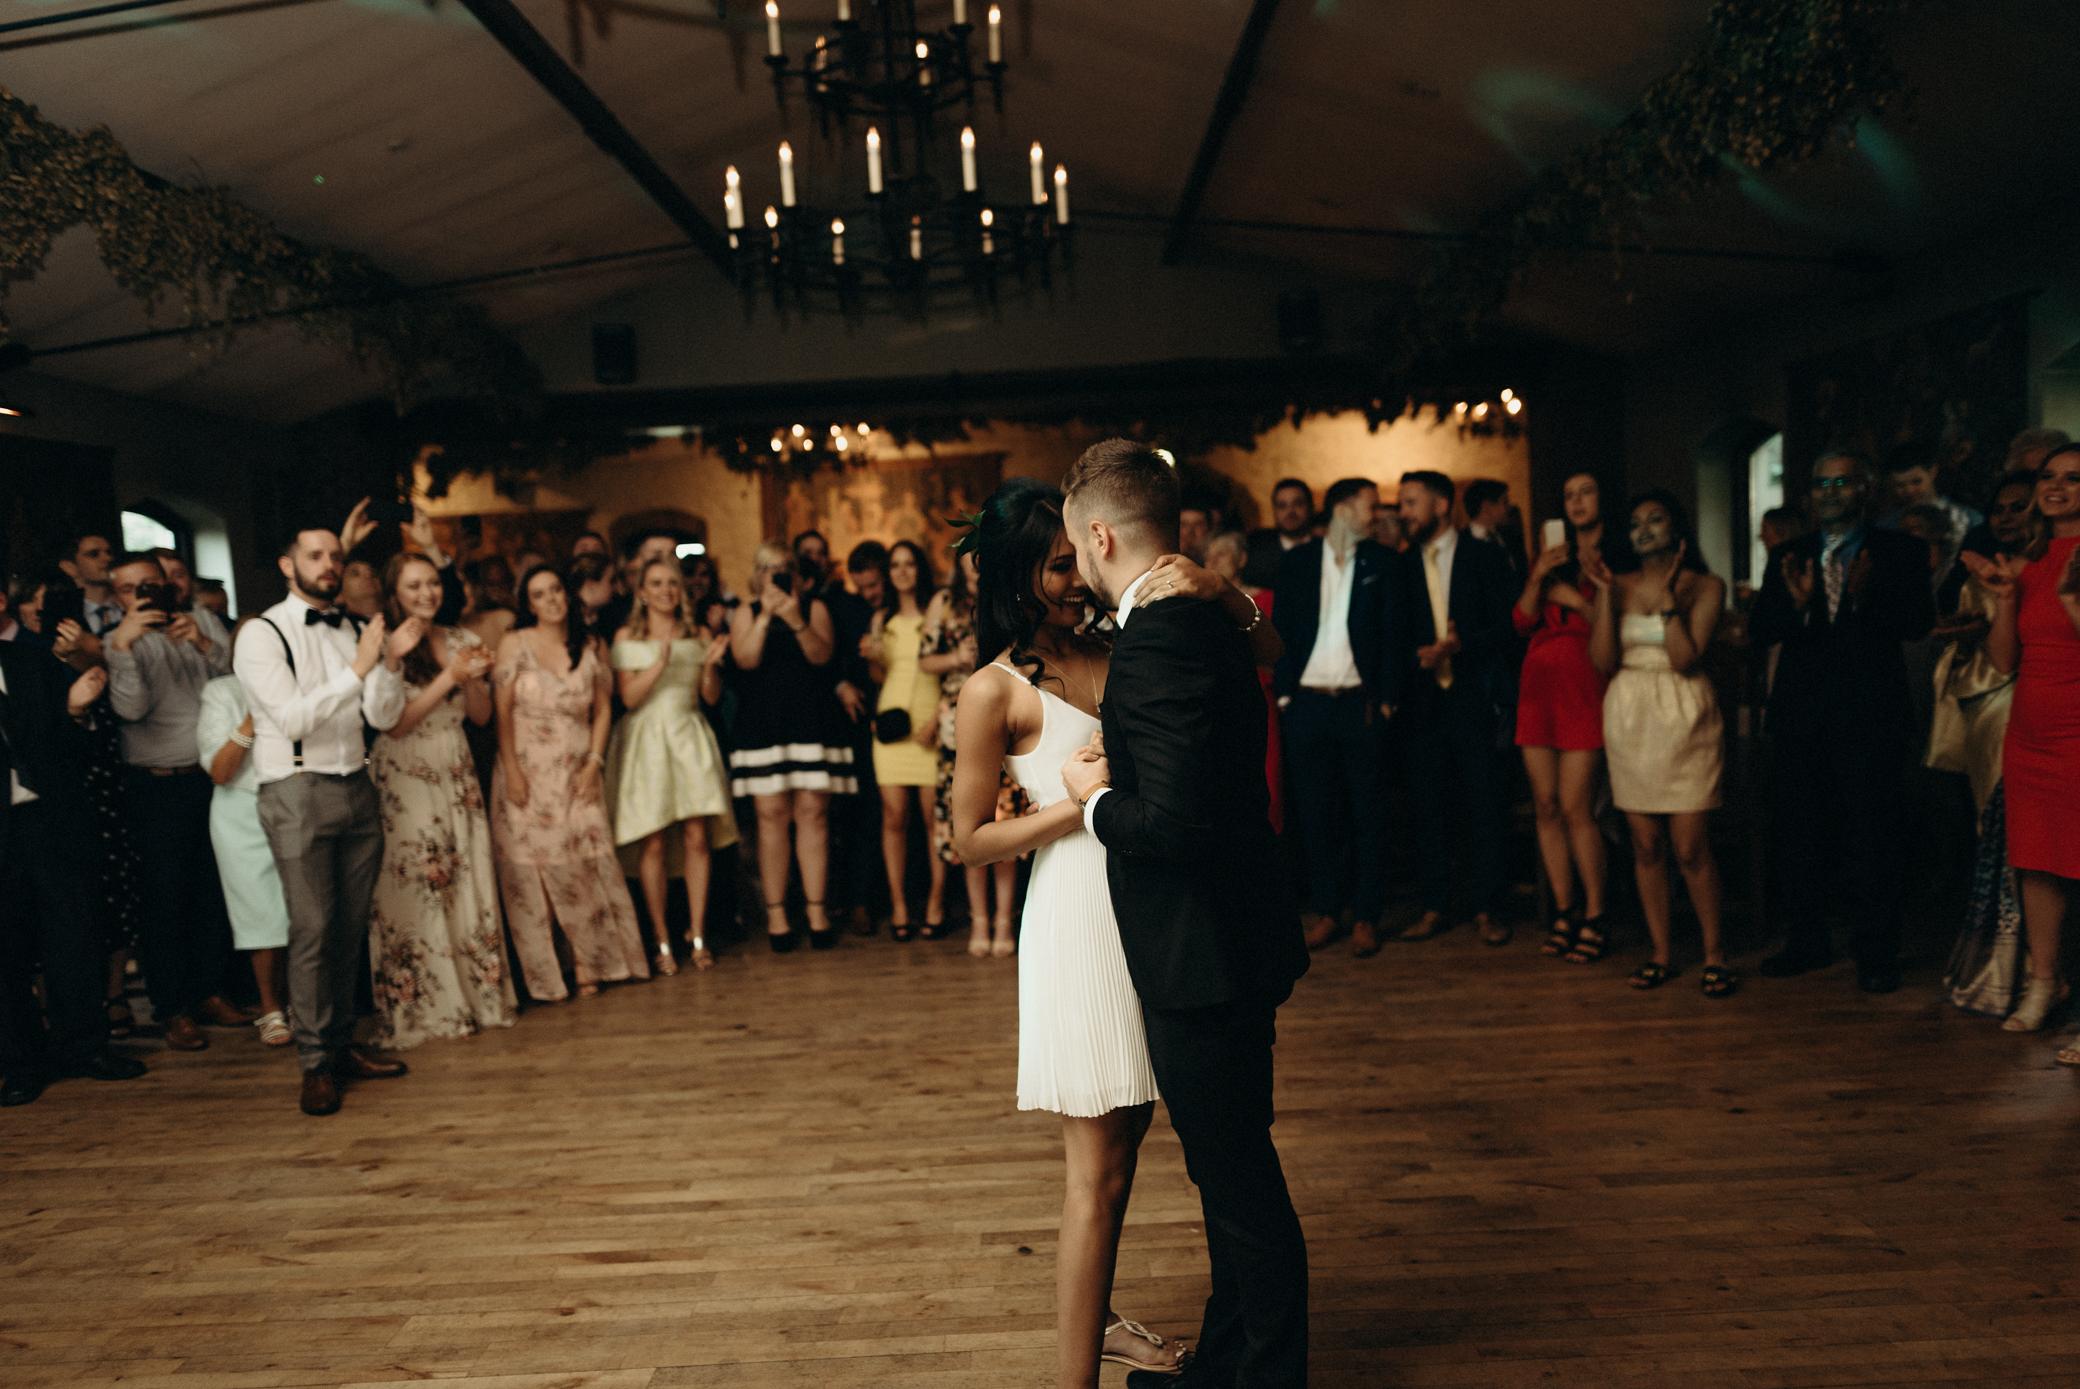 Alan&Naz- Barberstown Castle Wedding - Wedding photographer Ireland-206.jpg